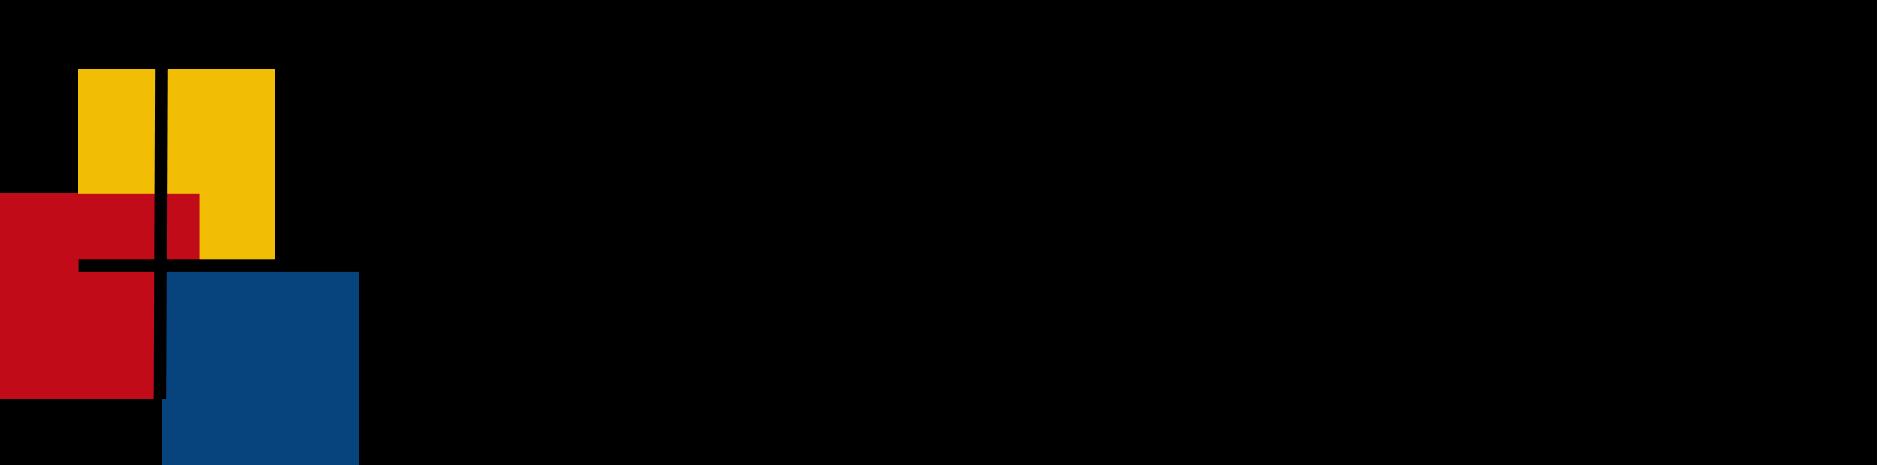 Aksa Group